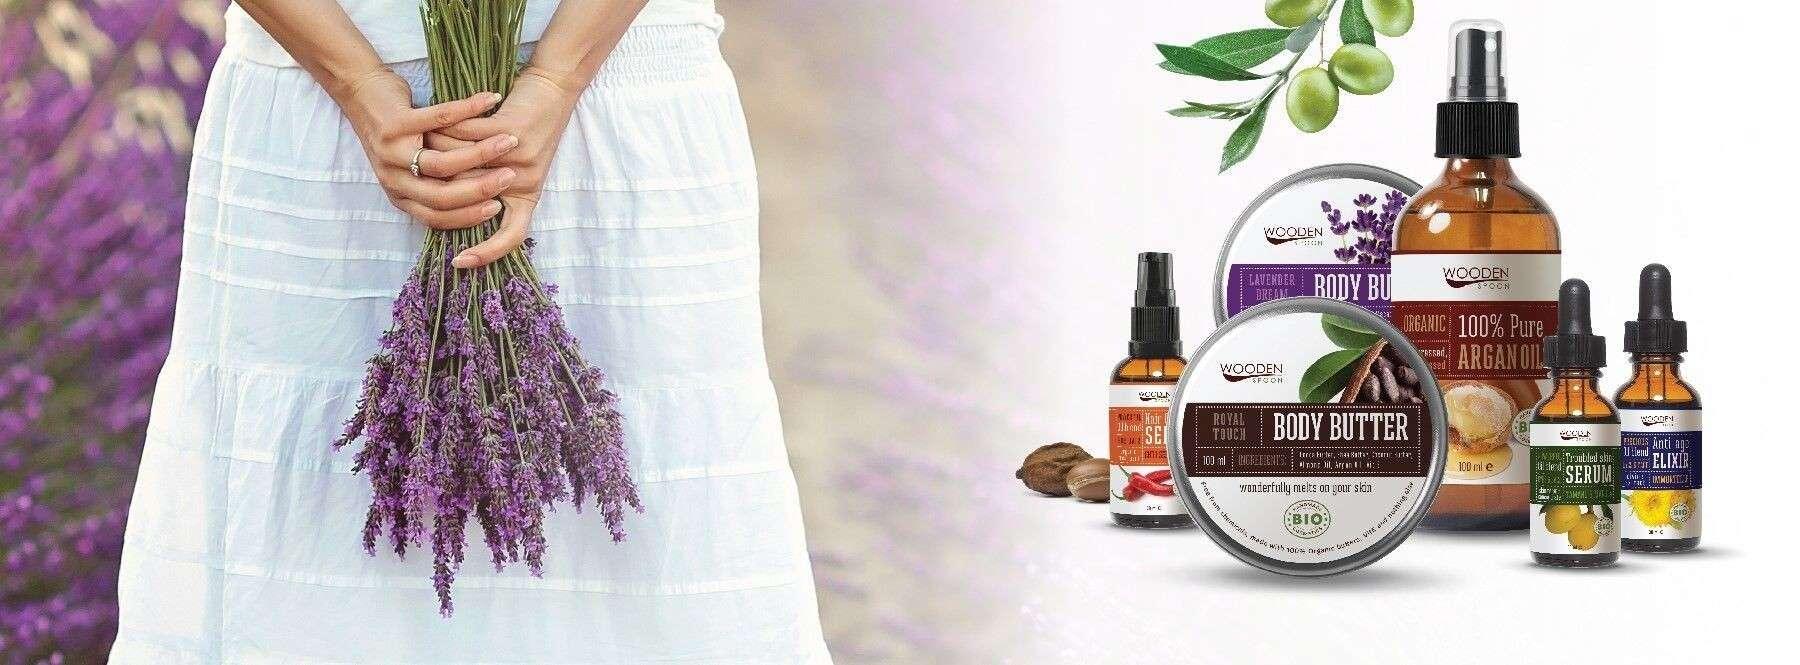 Organic kosmetik - Wooden Spoon